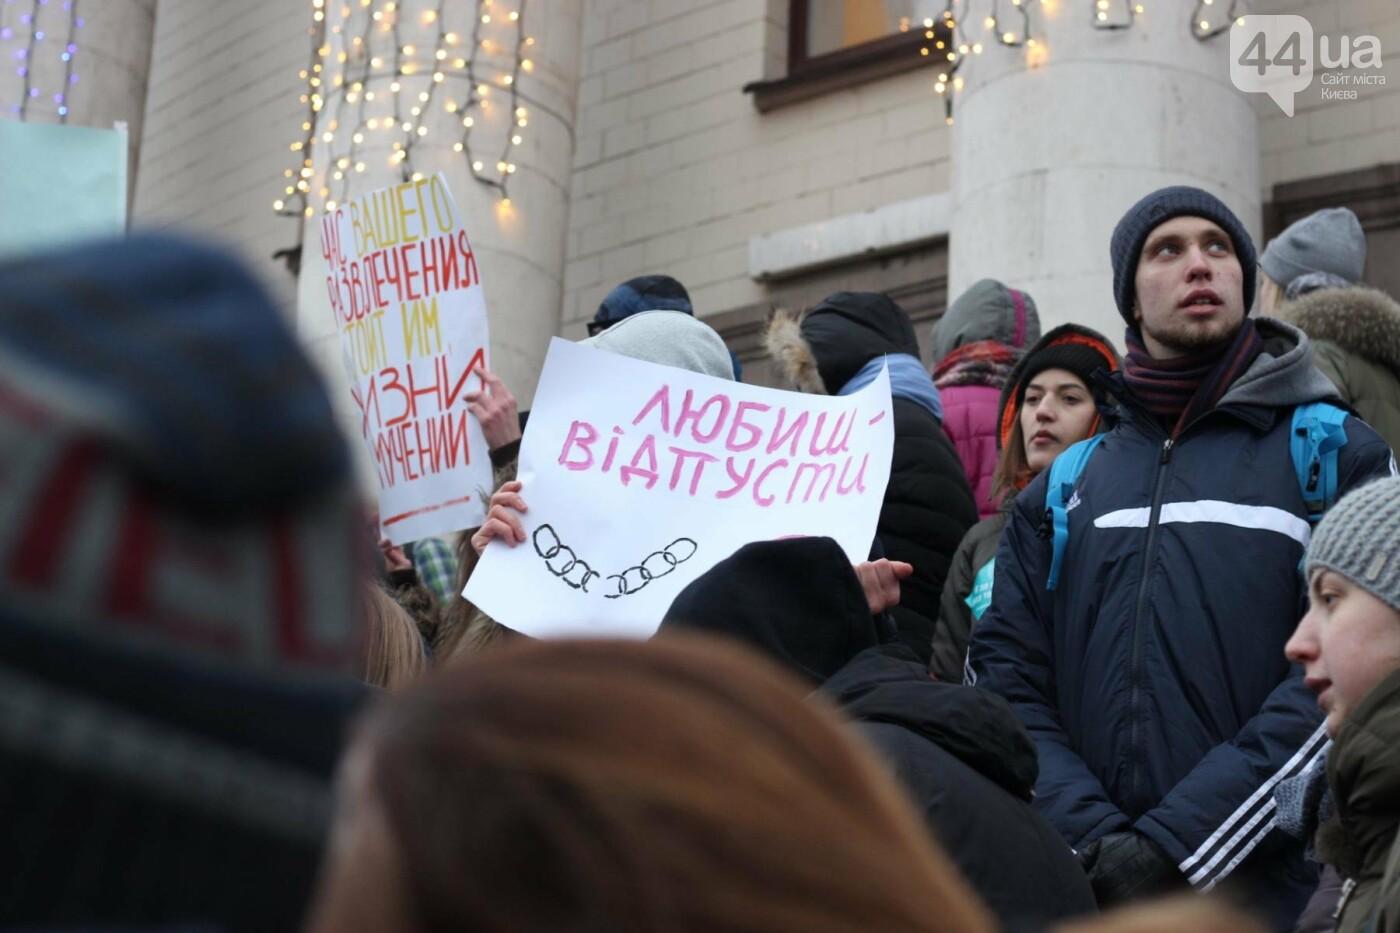 Цирк без животных: как в Киеве прошла акция протеста, фото-24